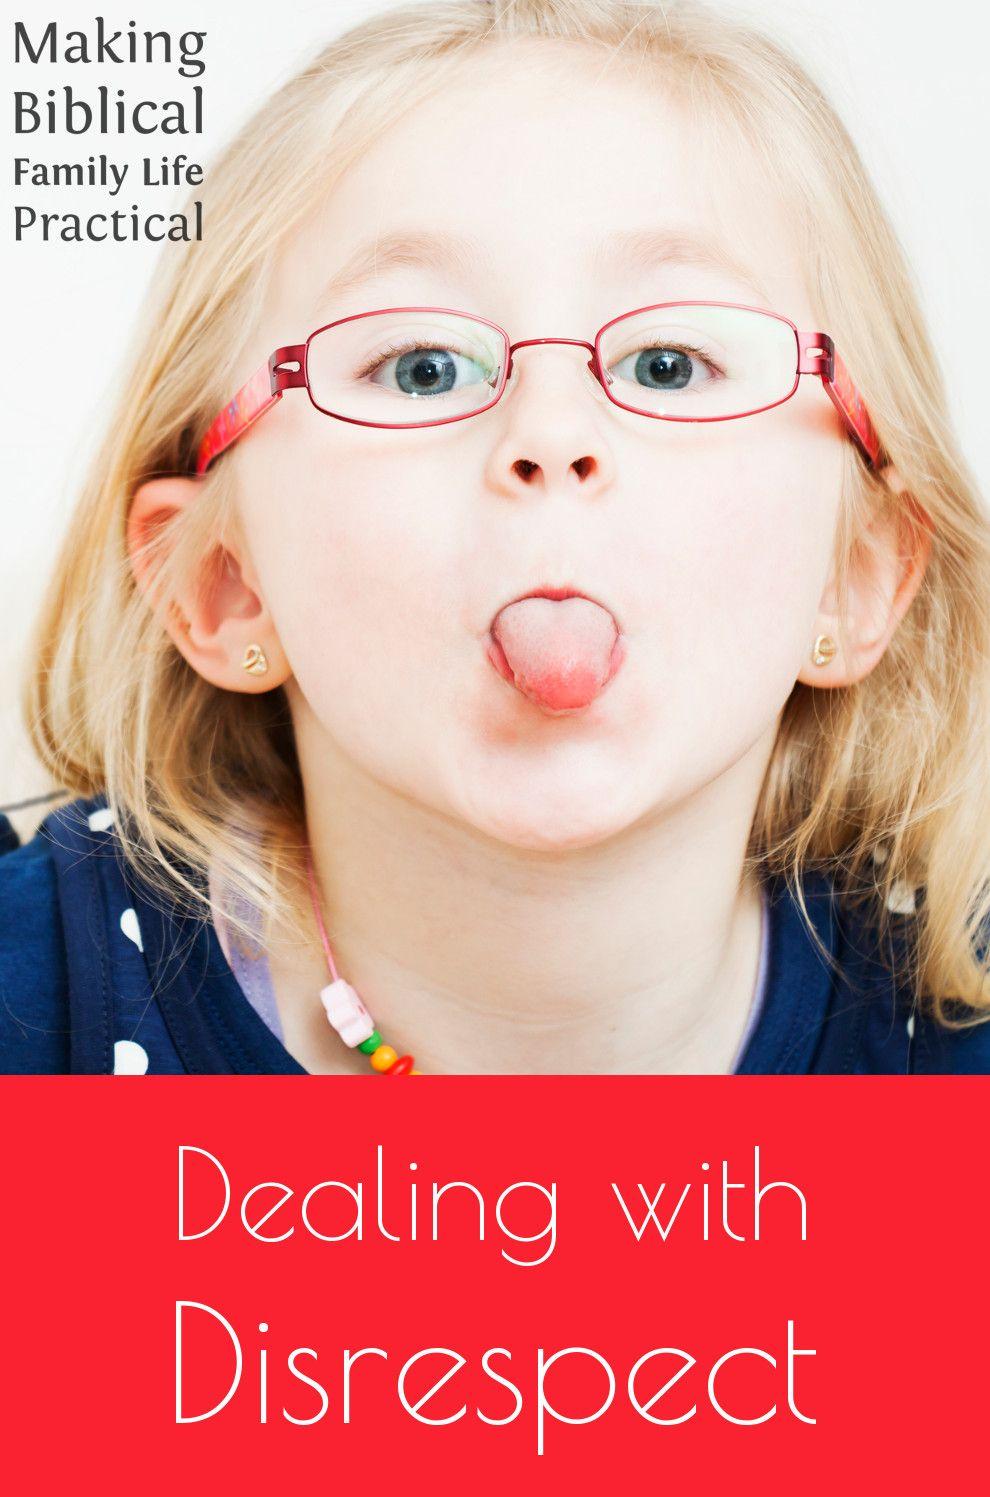 Dealing with disrespect mbflp 201 teaching kids